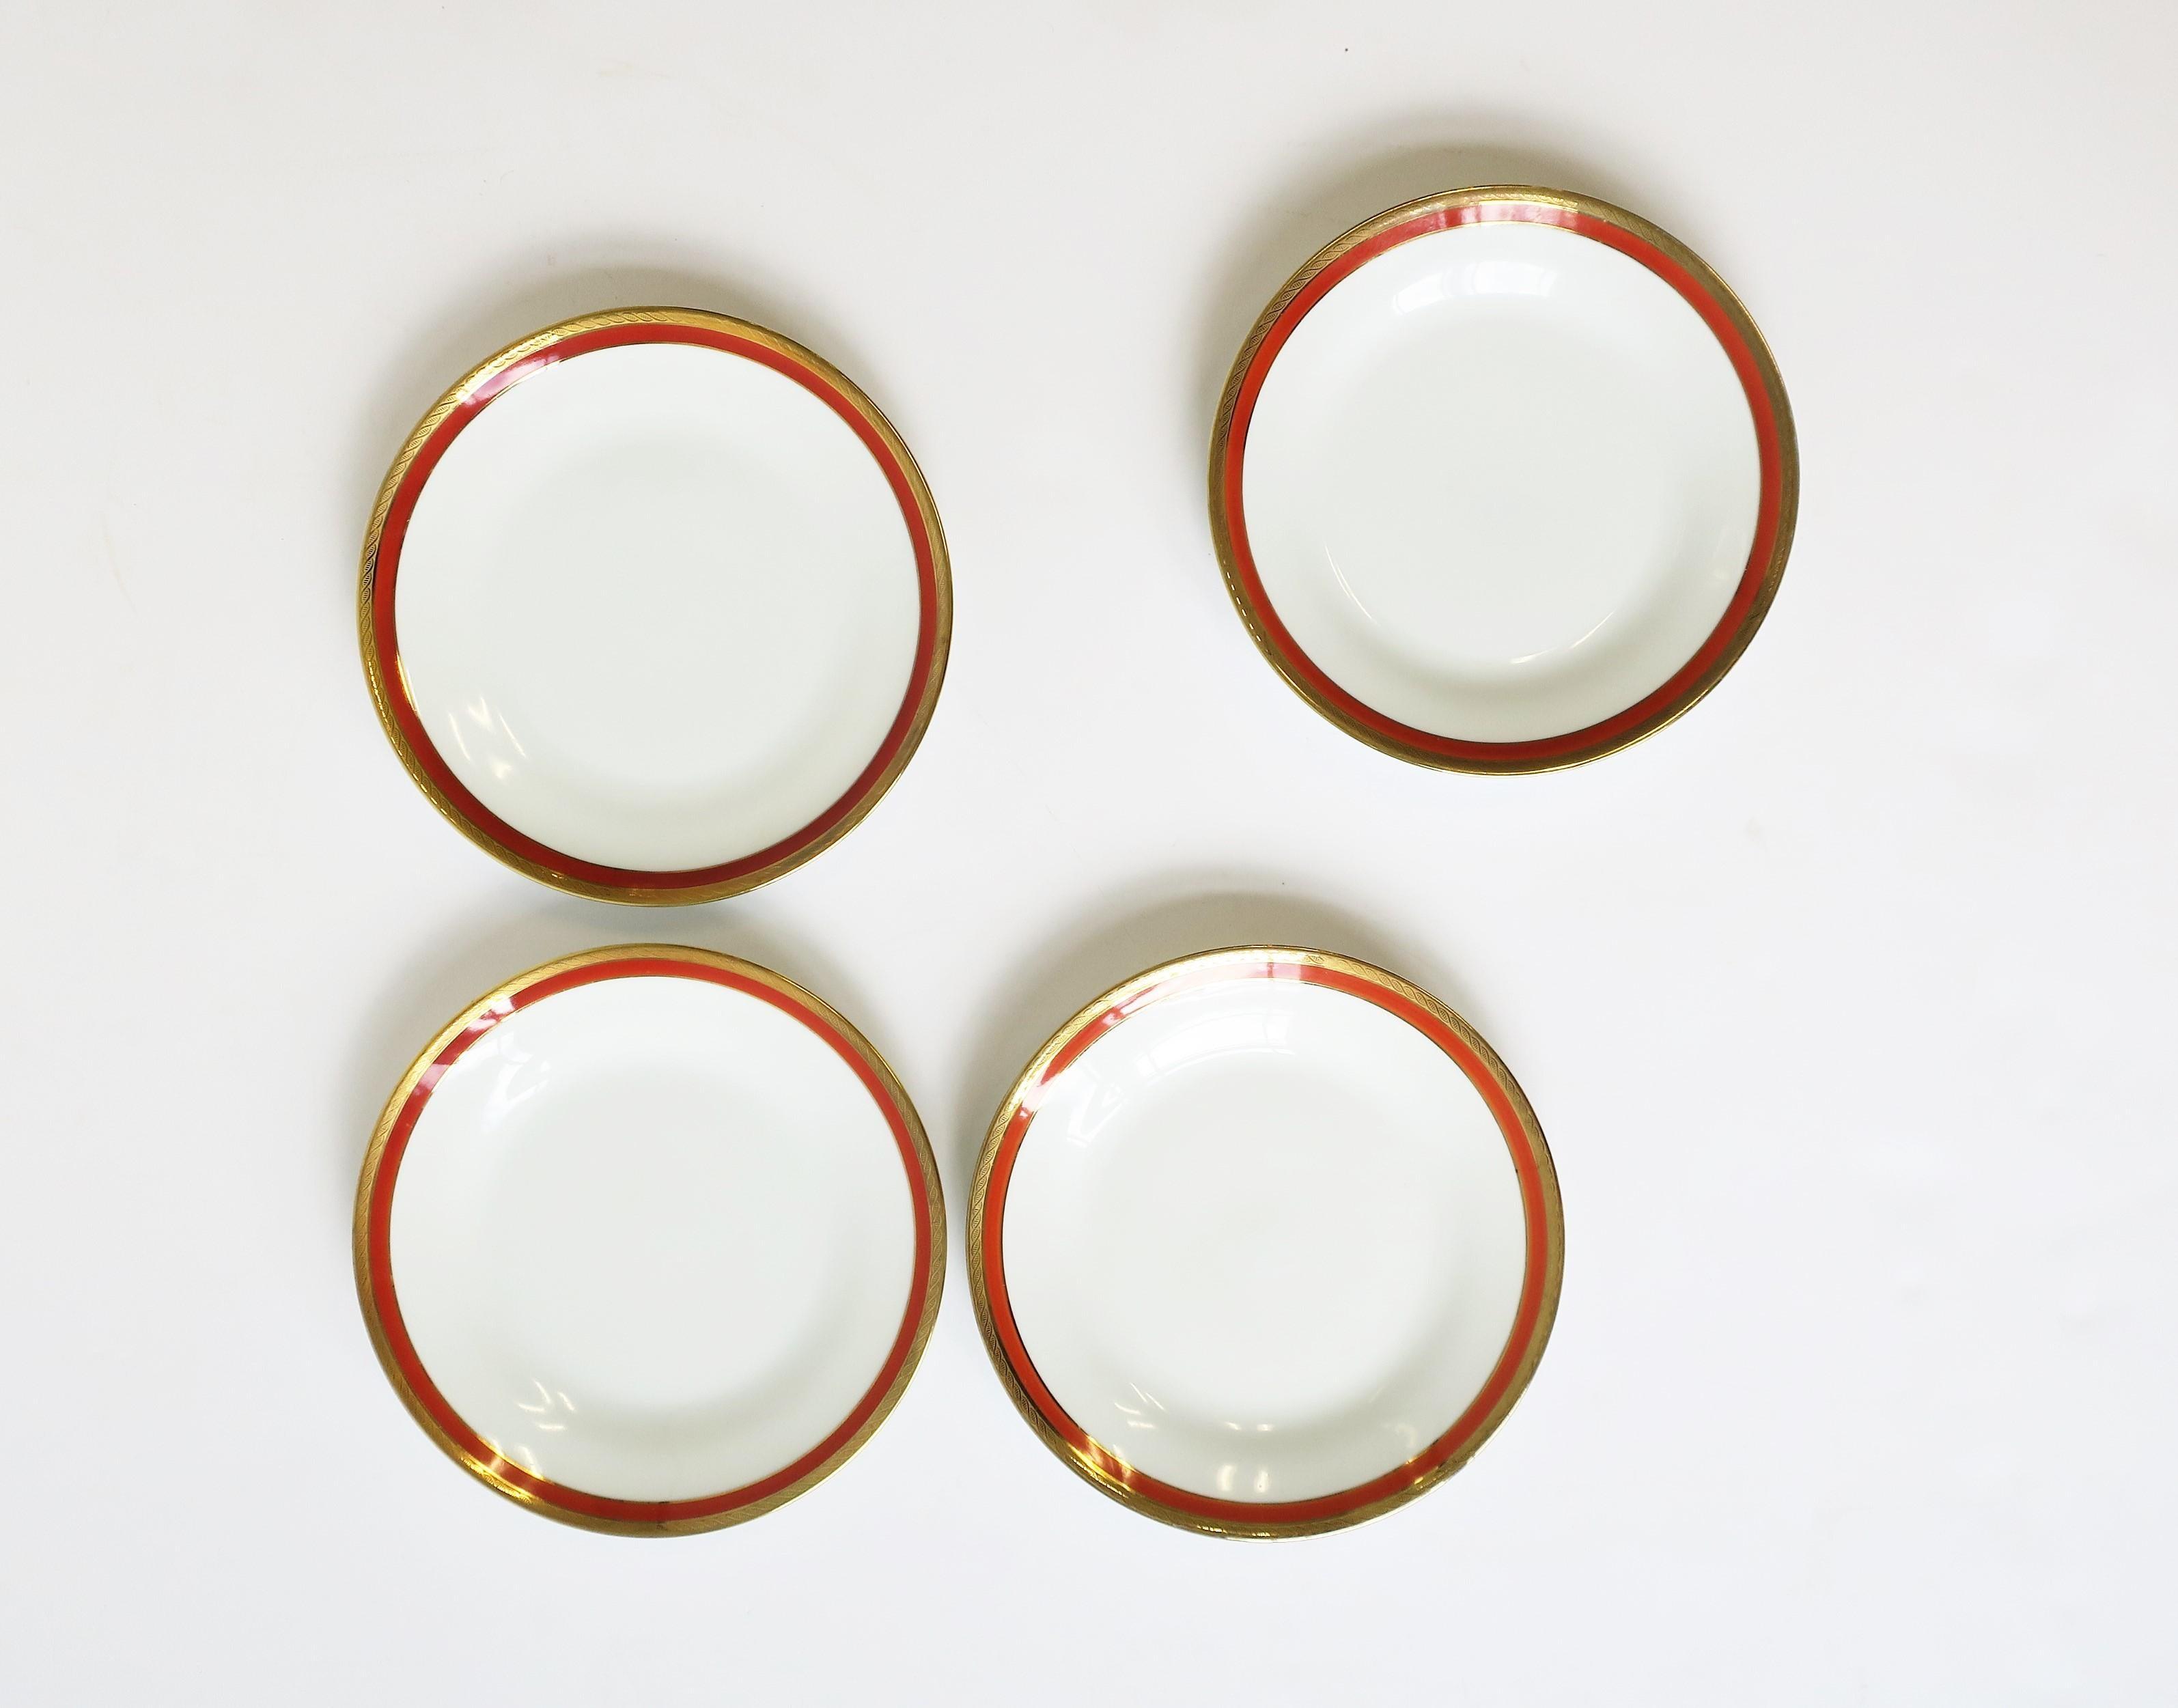 Vintage Porcelain Richard Ginori Italian White Gold and Orange Plates, Set of 4